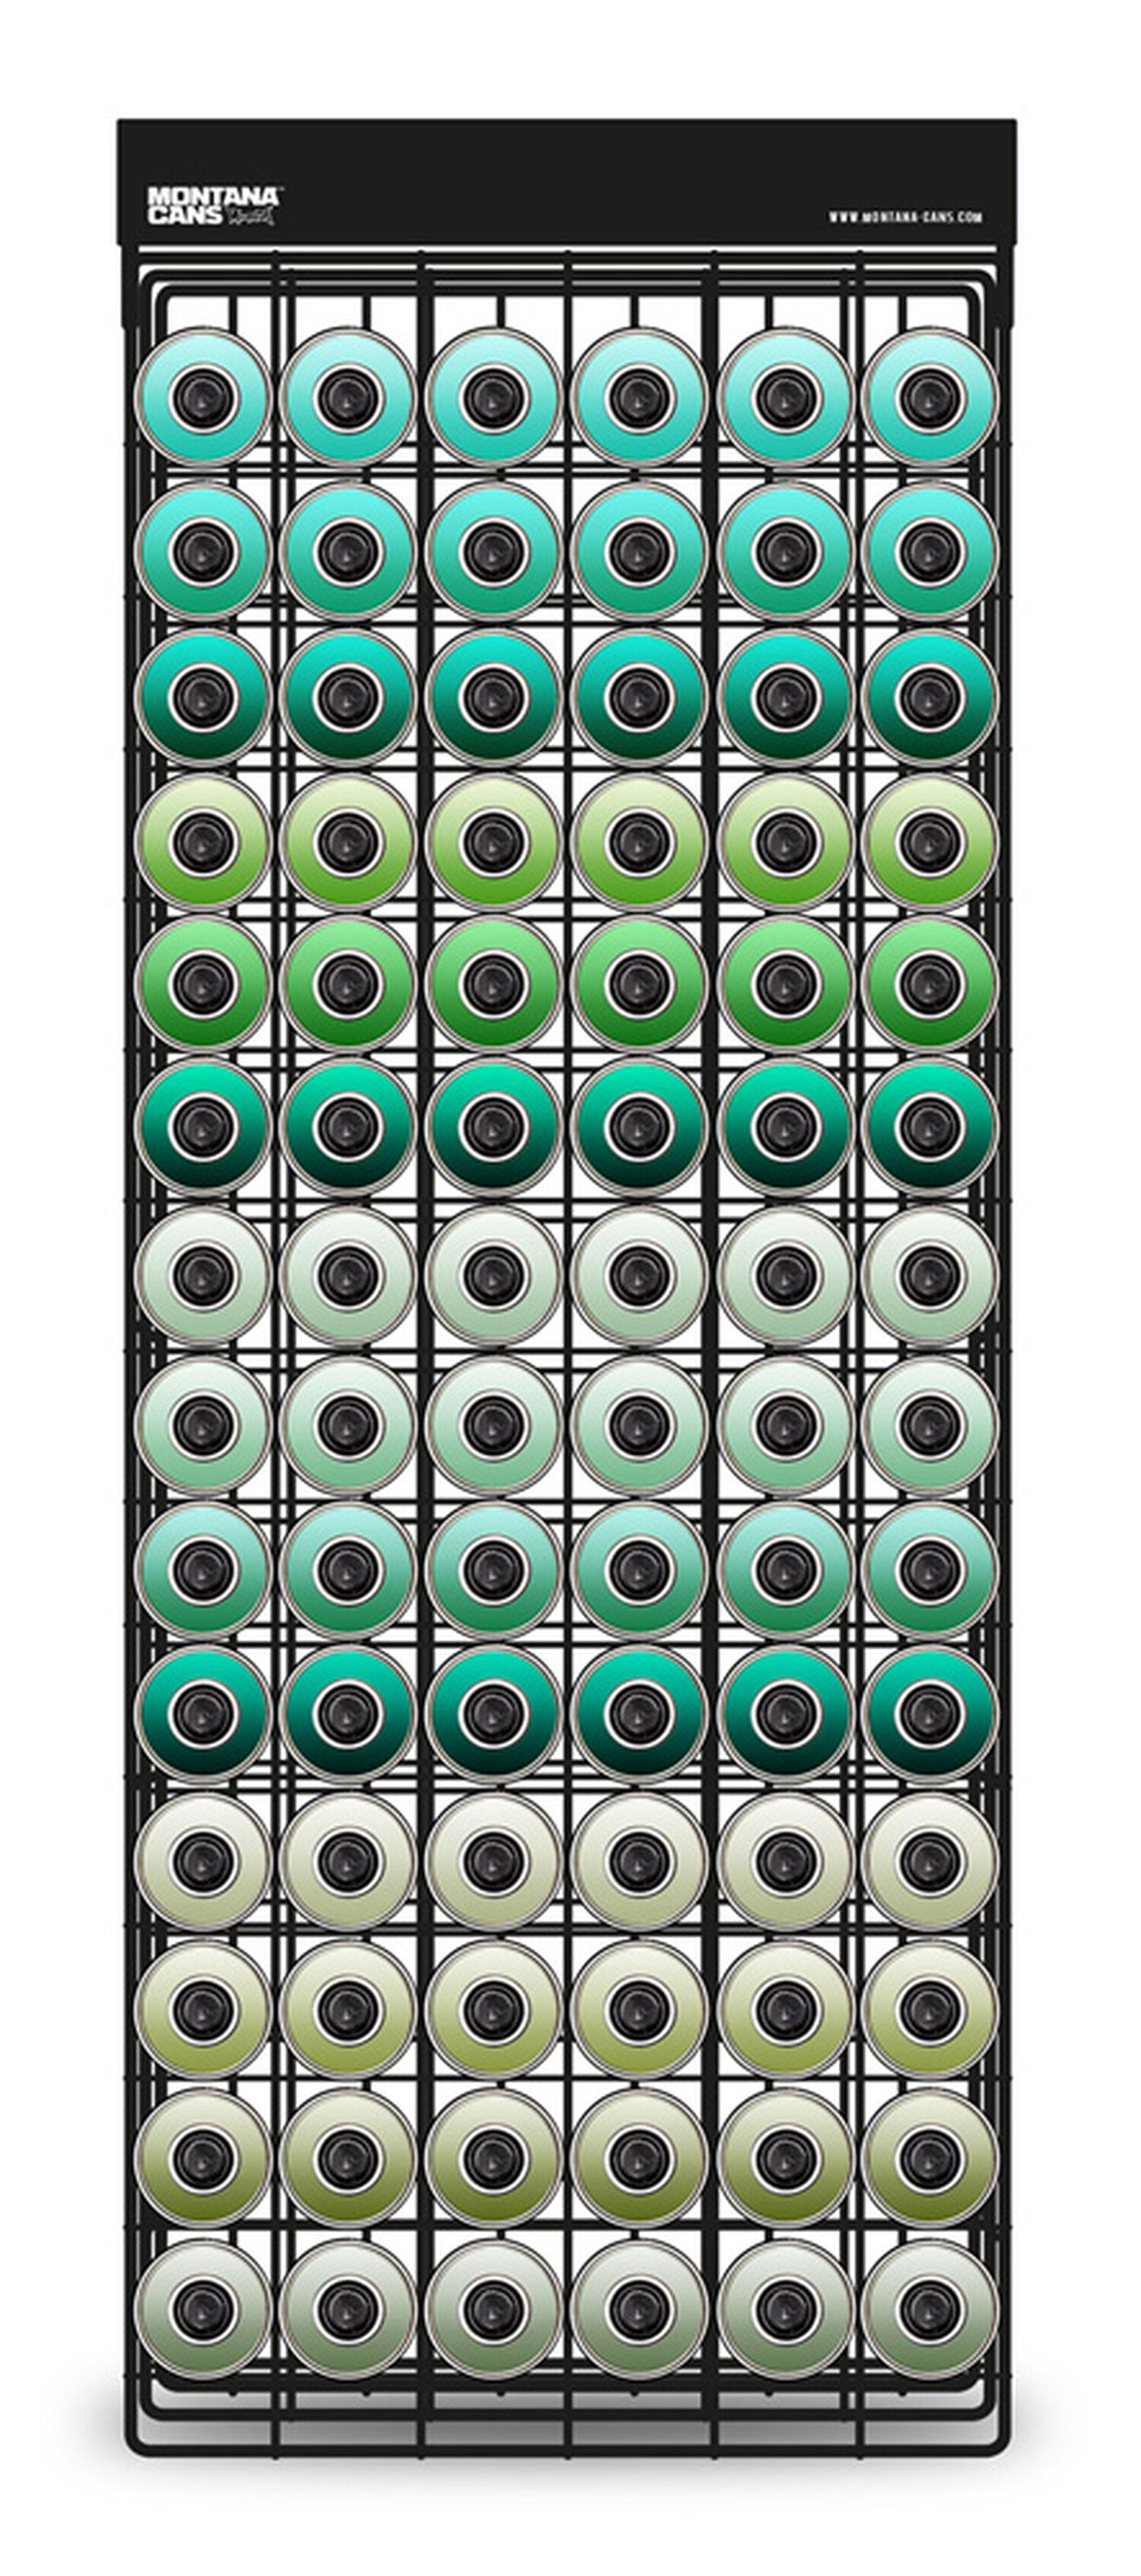 Studio Rack 84